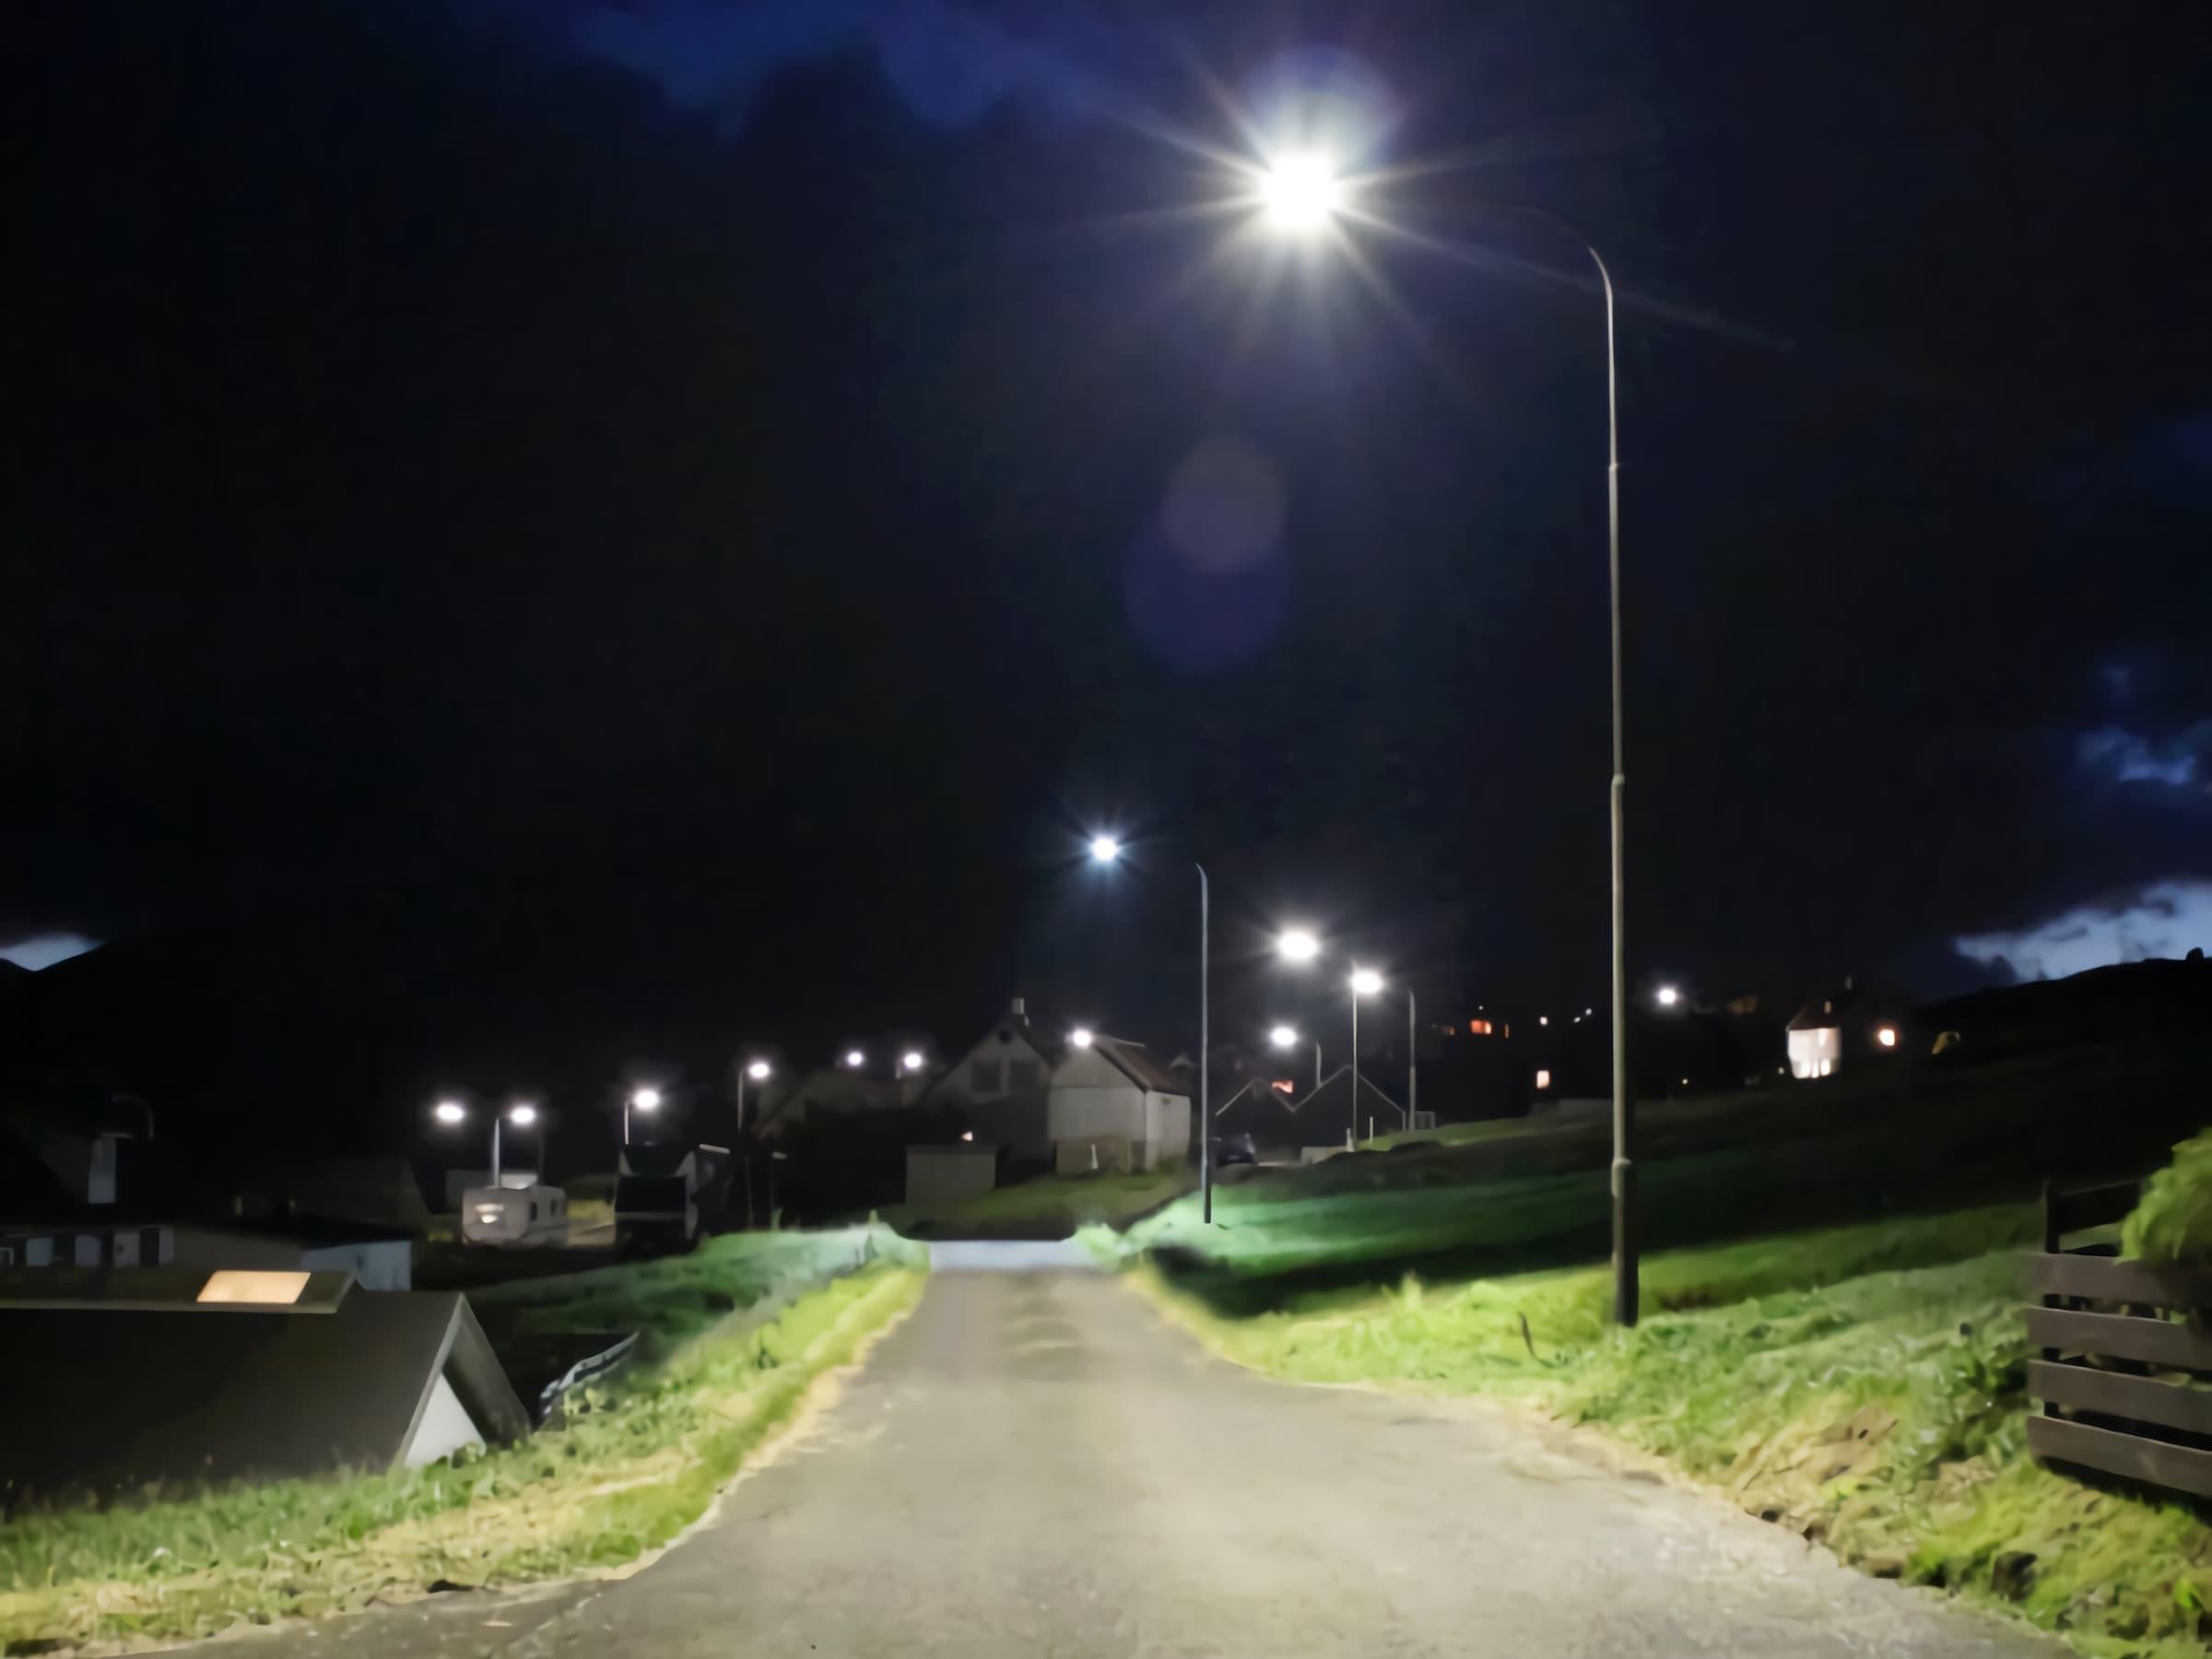 led-street-lights-provides-bright-light-in-the-villiage-of-Faroe-islands